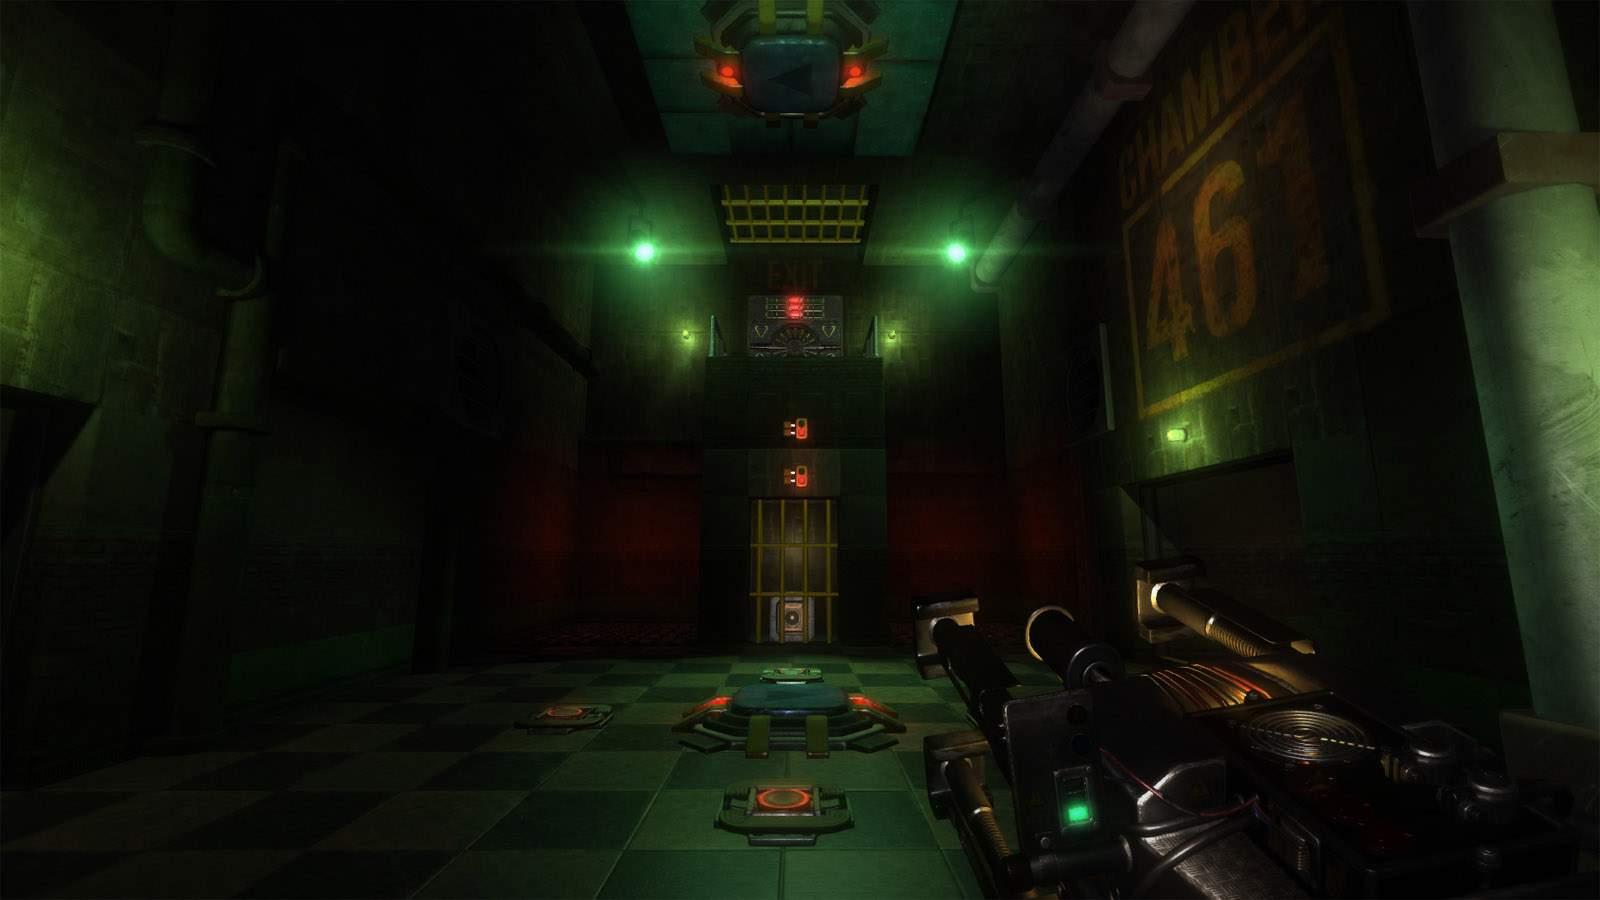 تحميل لعبة Magnetic Cage Closed مضغوطة برابط واحد مباشر كاملة مجانا